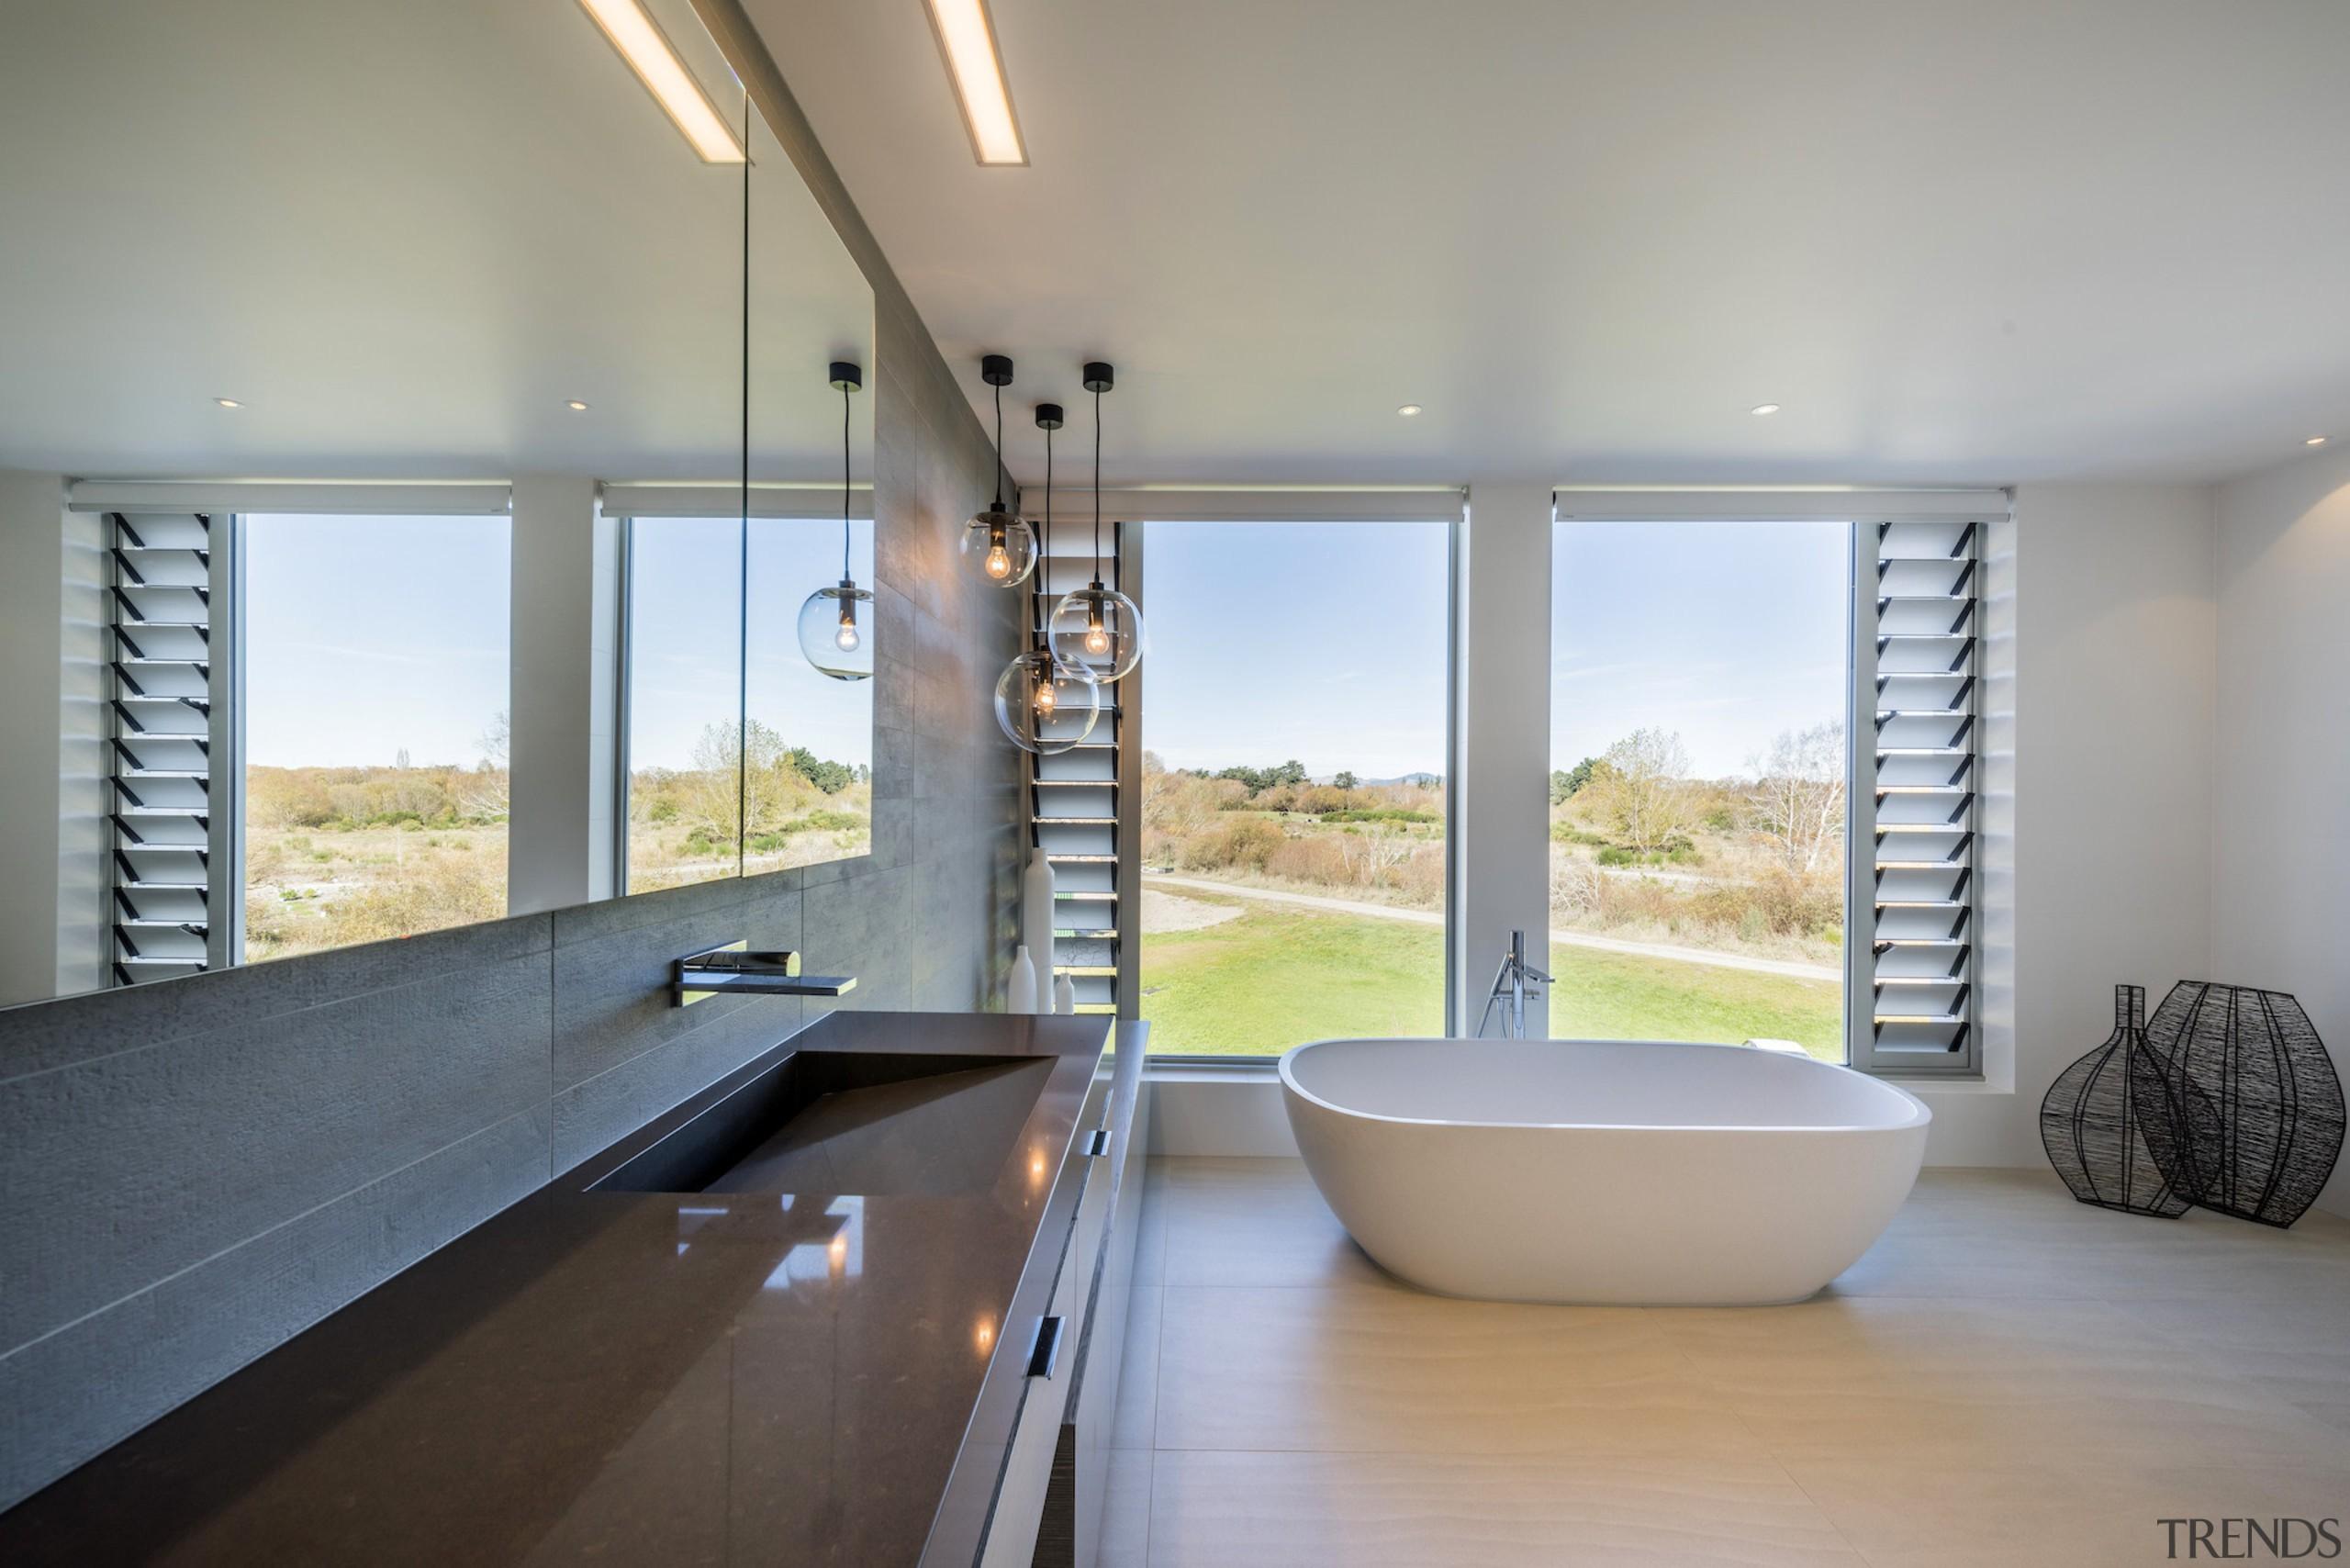 Modern, restrained master ensuite by designer Davinia Sutton architecture, bathroom, daylighting, estate, house, interior design, real estate, room, window, gray